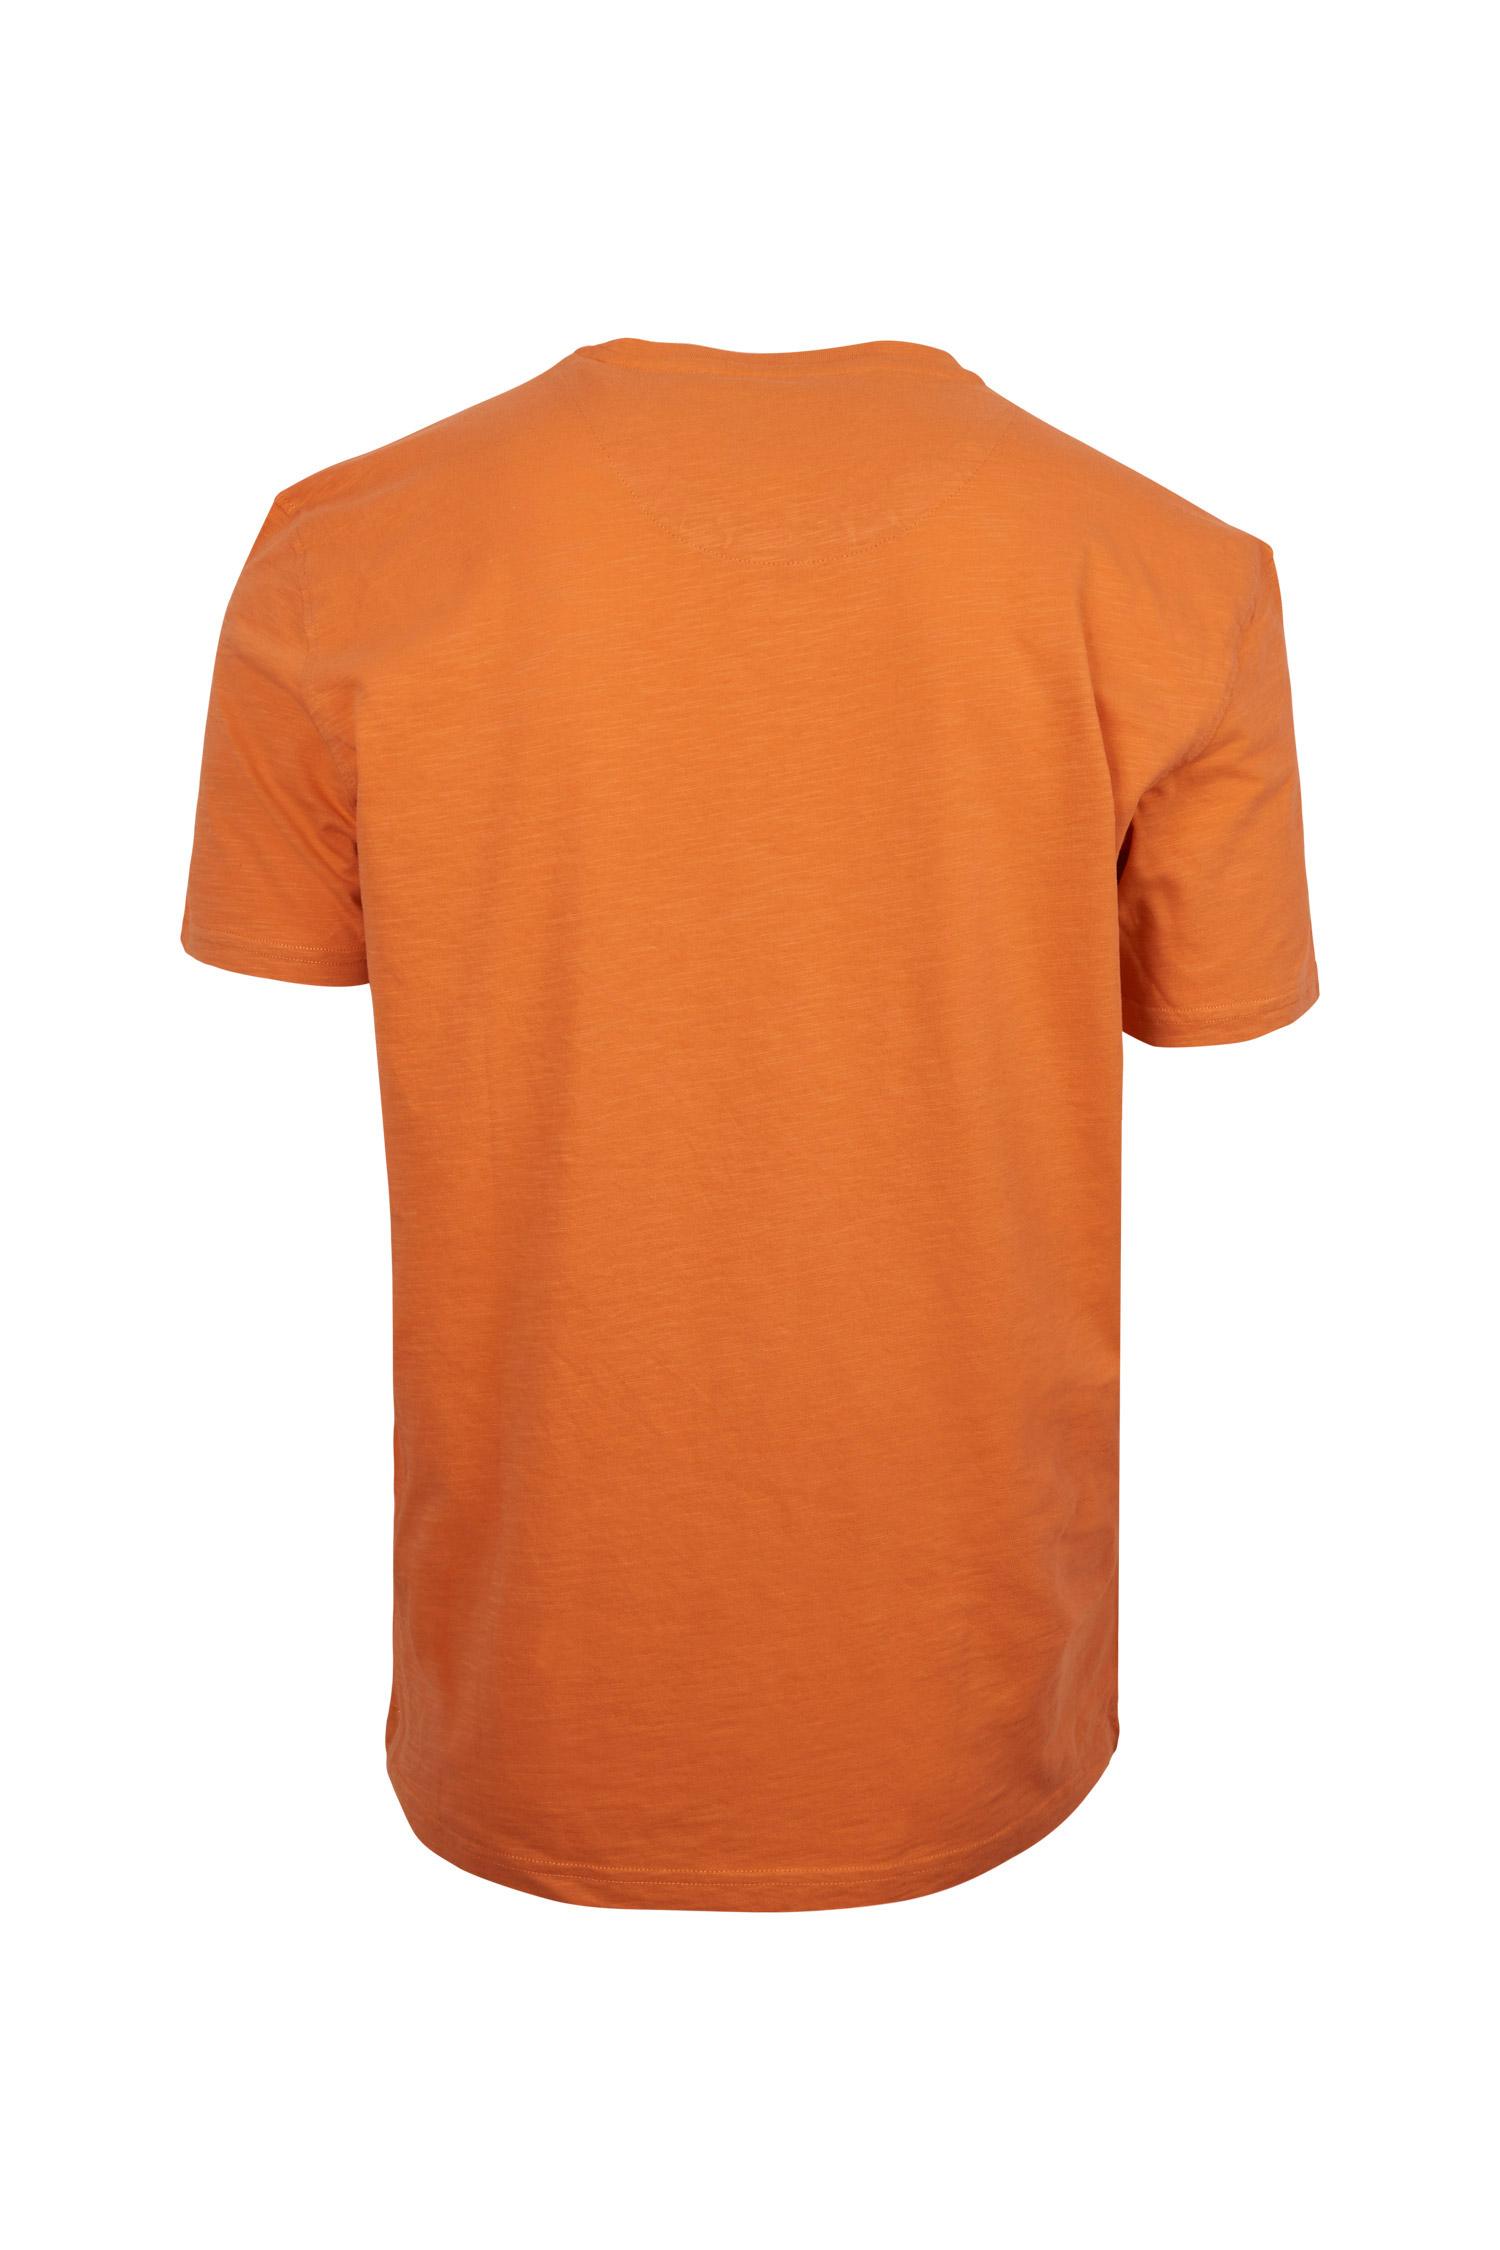 Sport, Camisetas M. Corta, 109161, NARANJA | Zoom